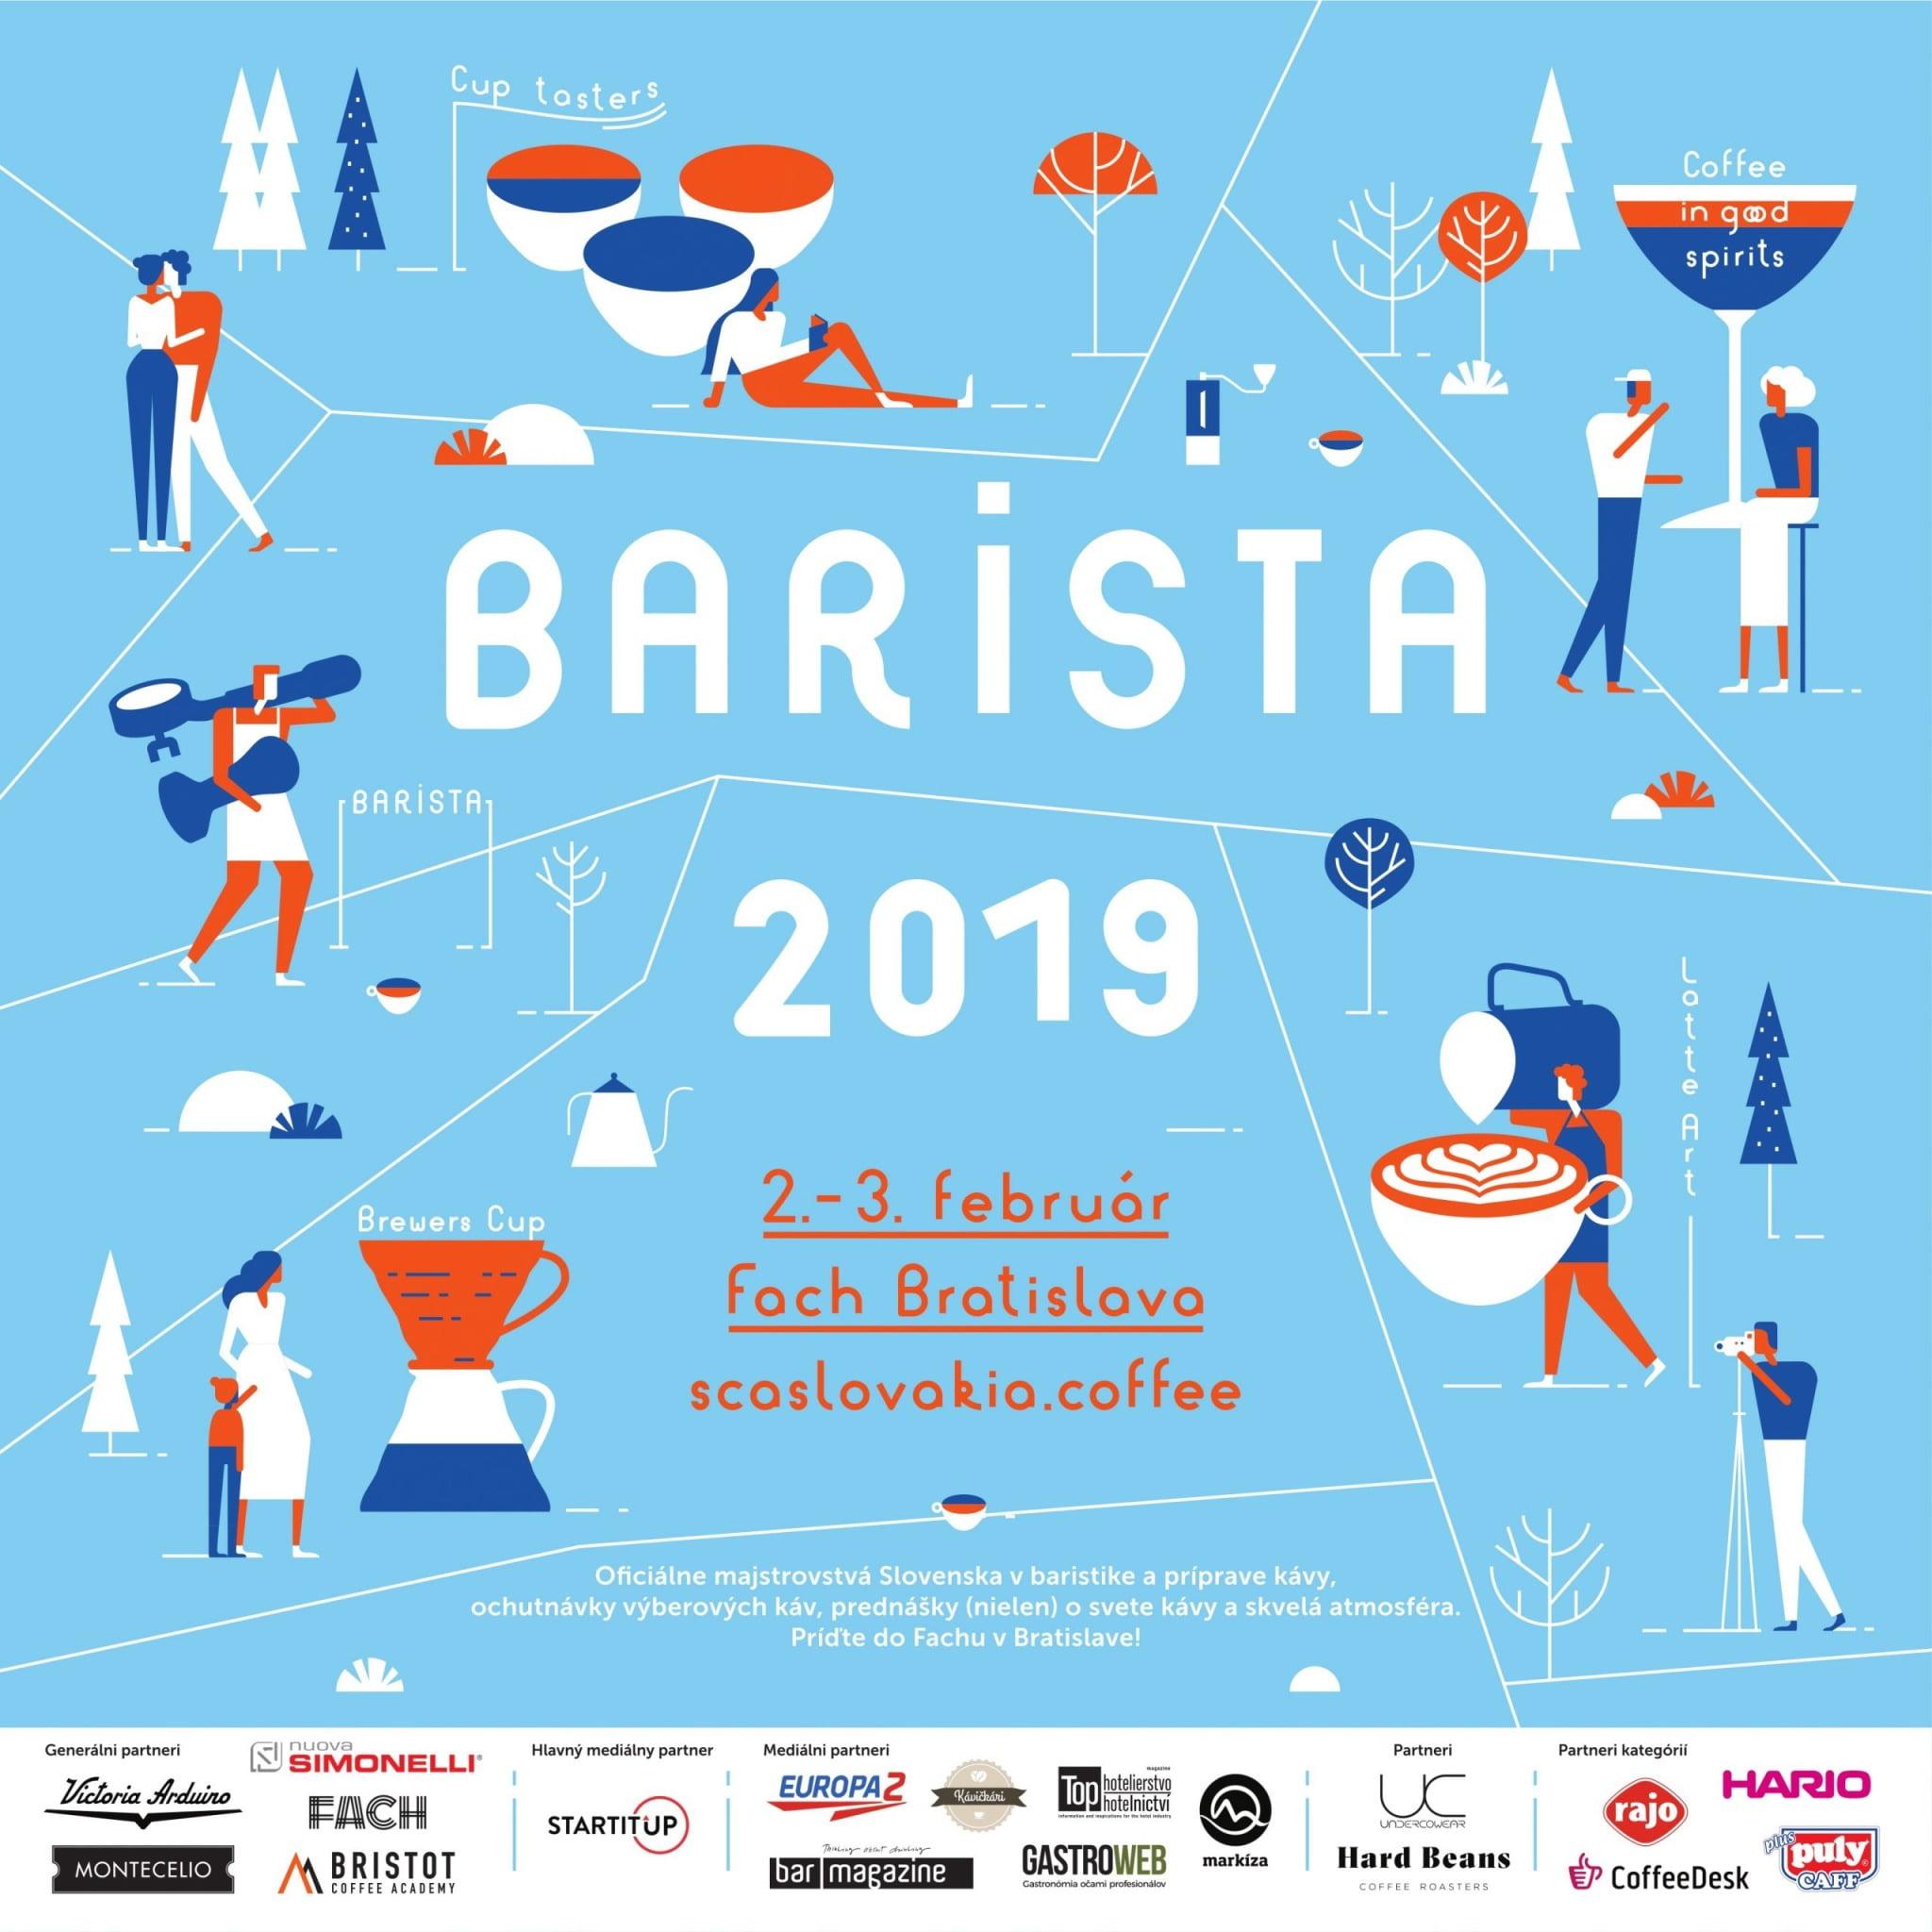 Barista 2019